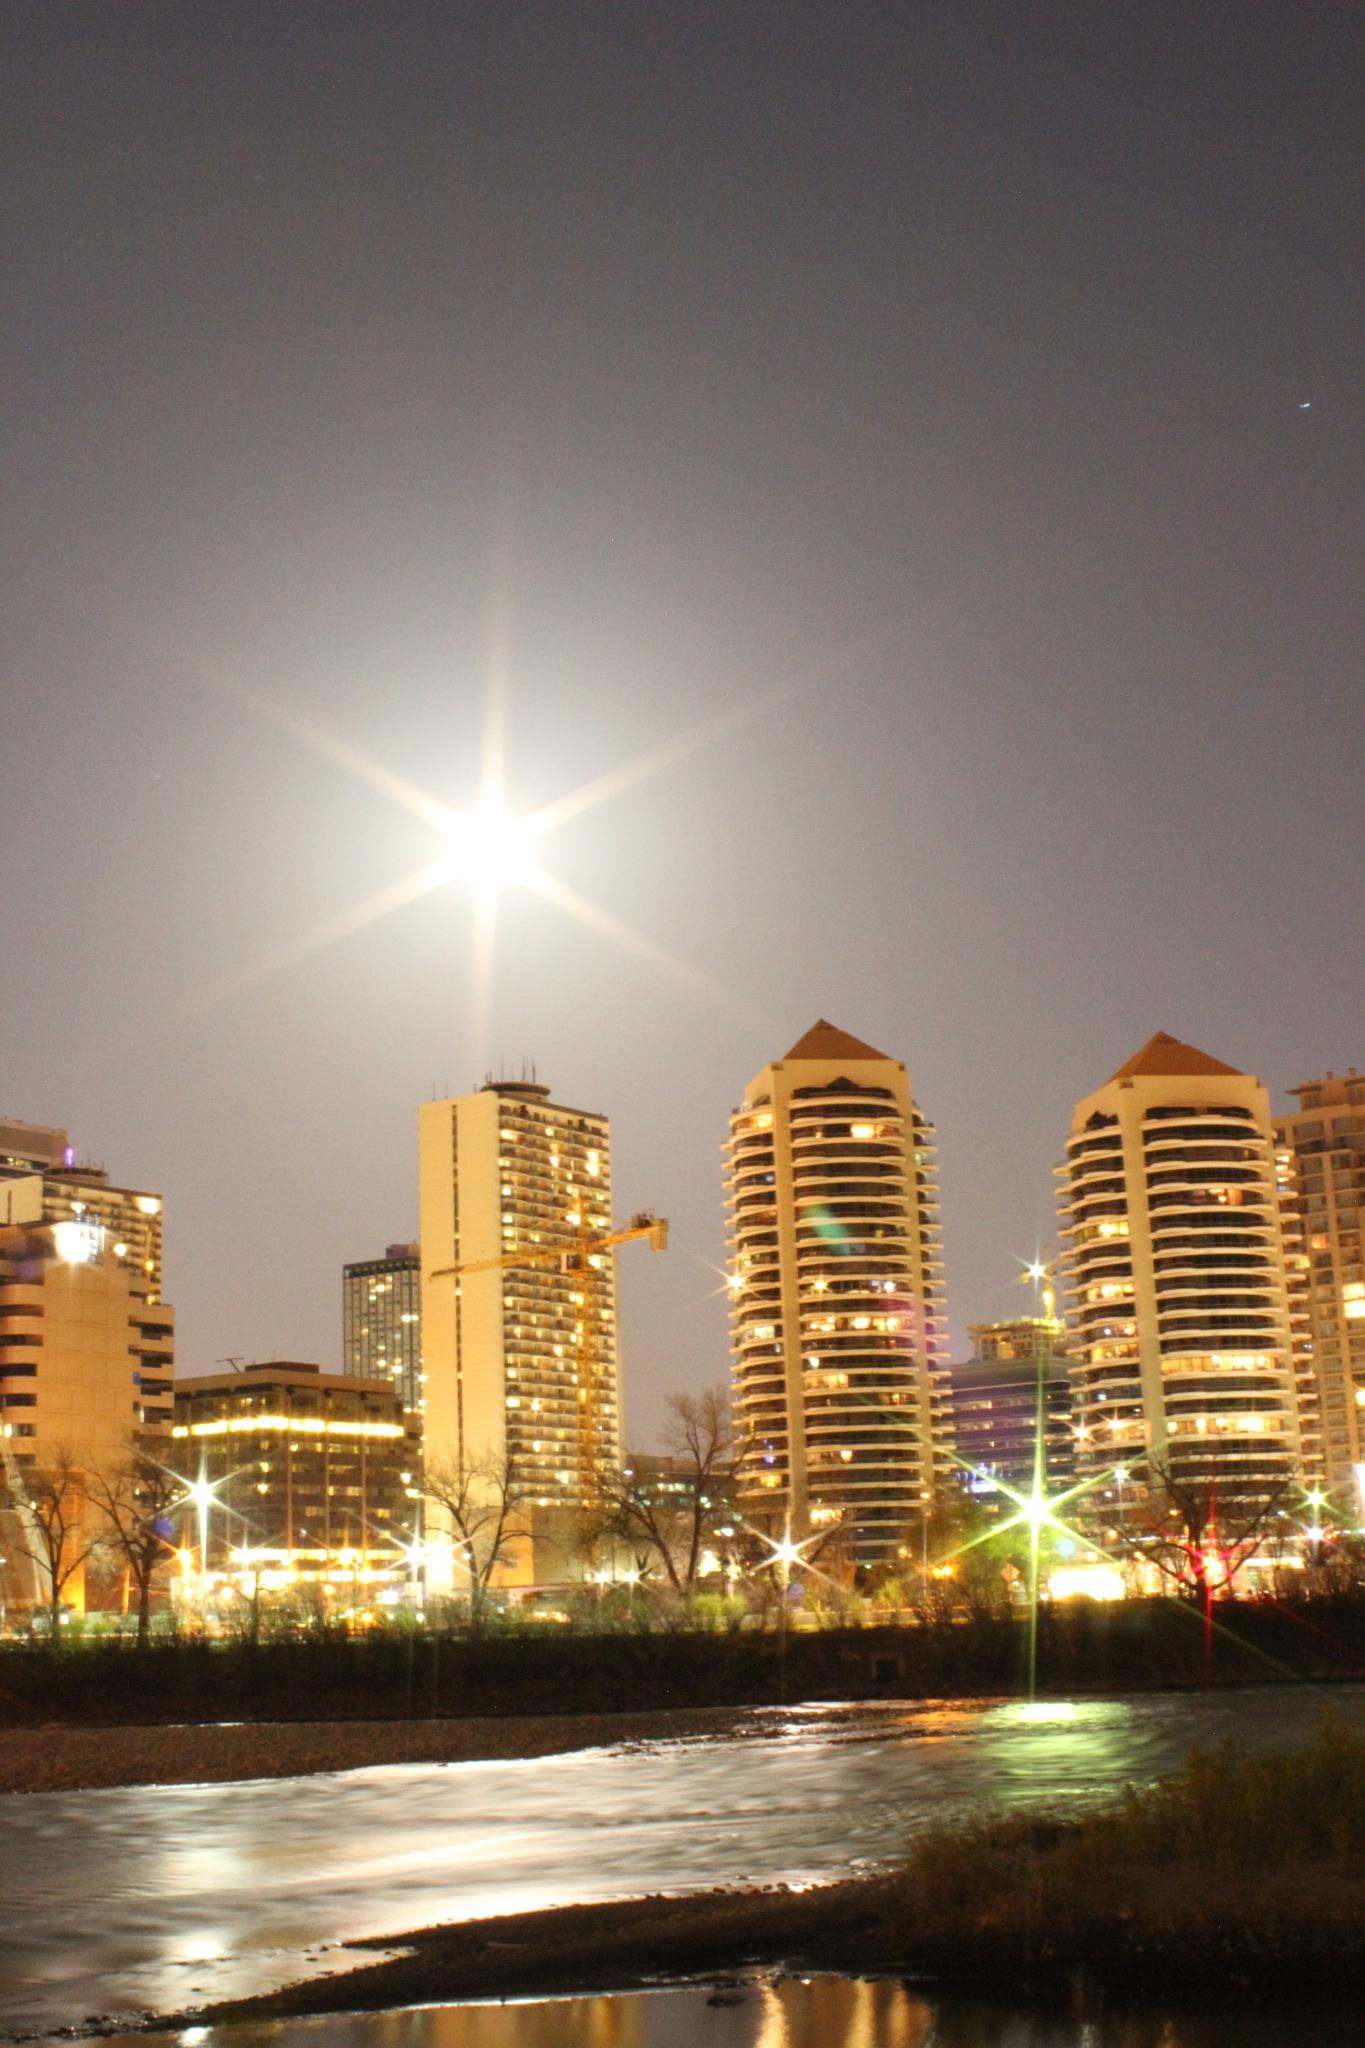 Calgary by night by jl.samjane